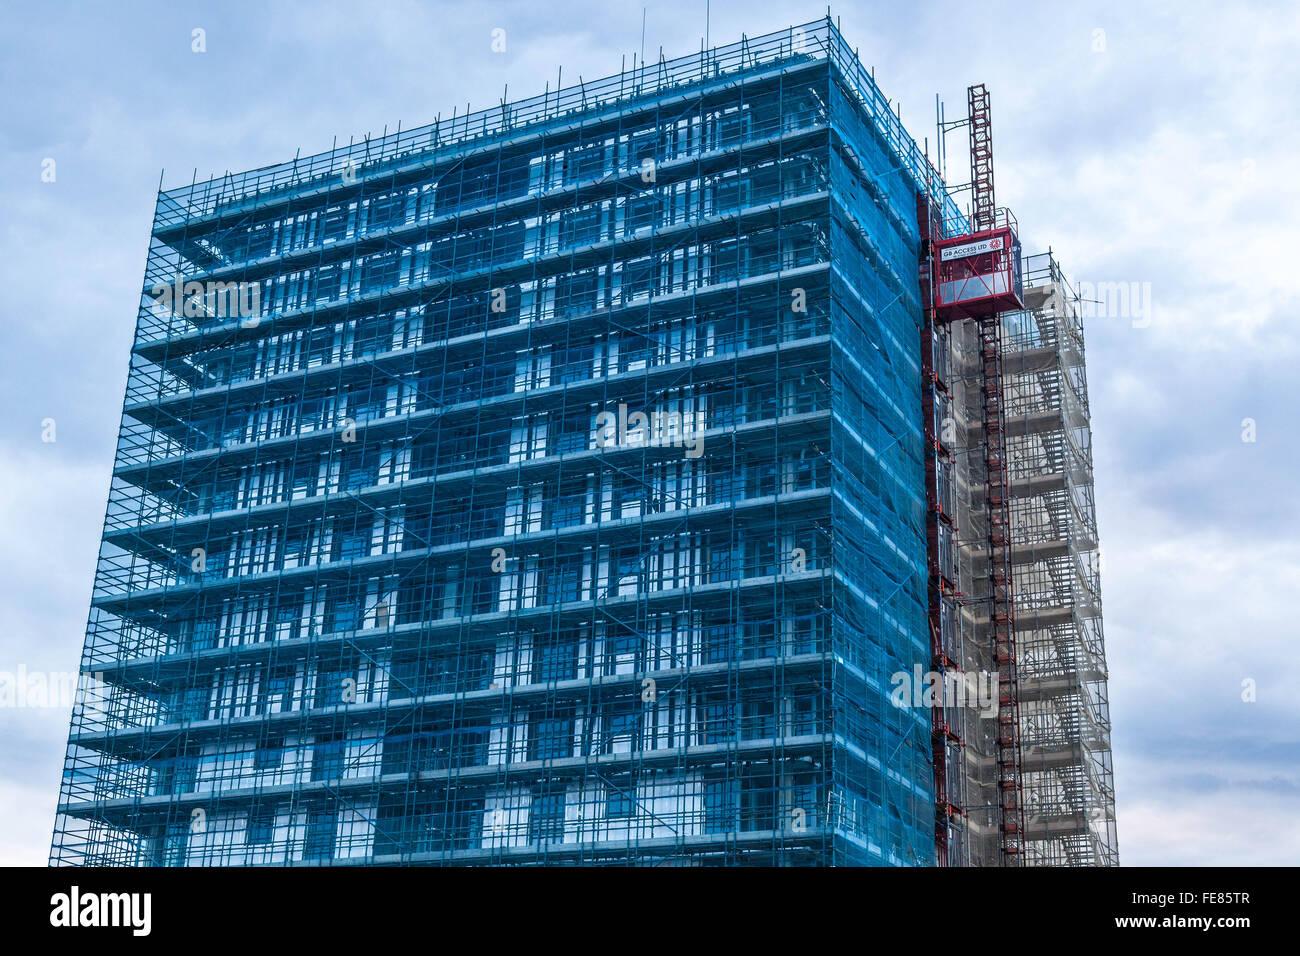 Scaffolding netting on building, Edgware, Greater London, England, UK - Stock Image